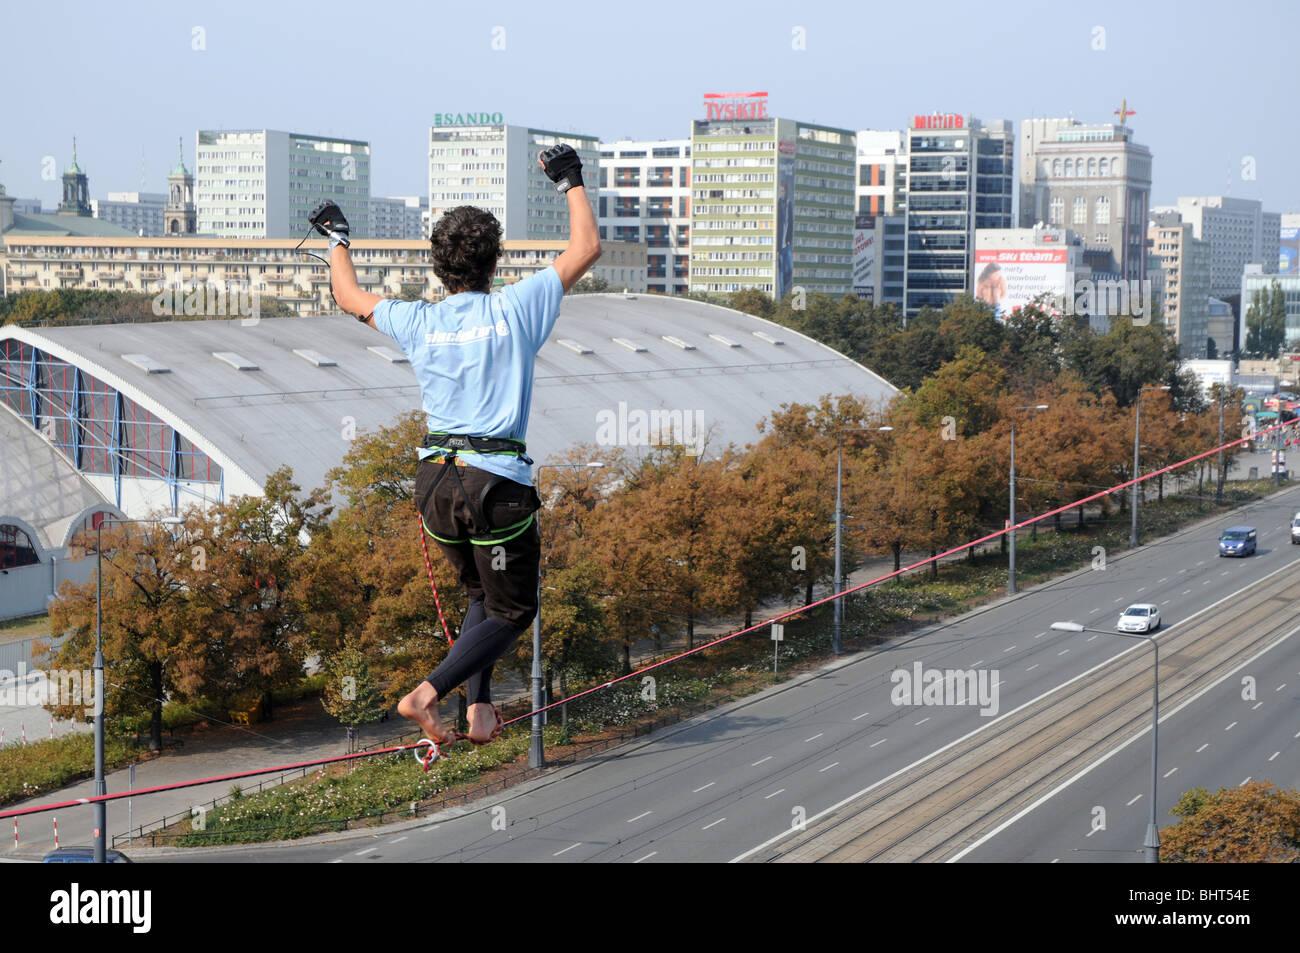 Polish slackliner Jan Galek during show in Warsaw, Poland - Stock Image